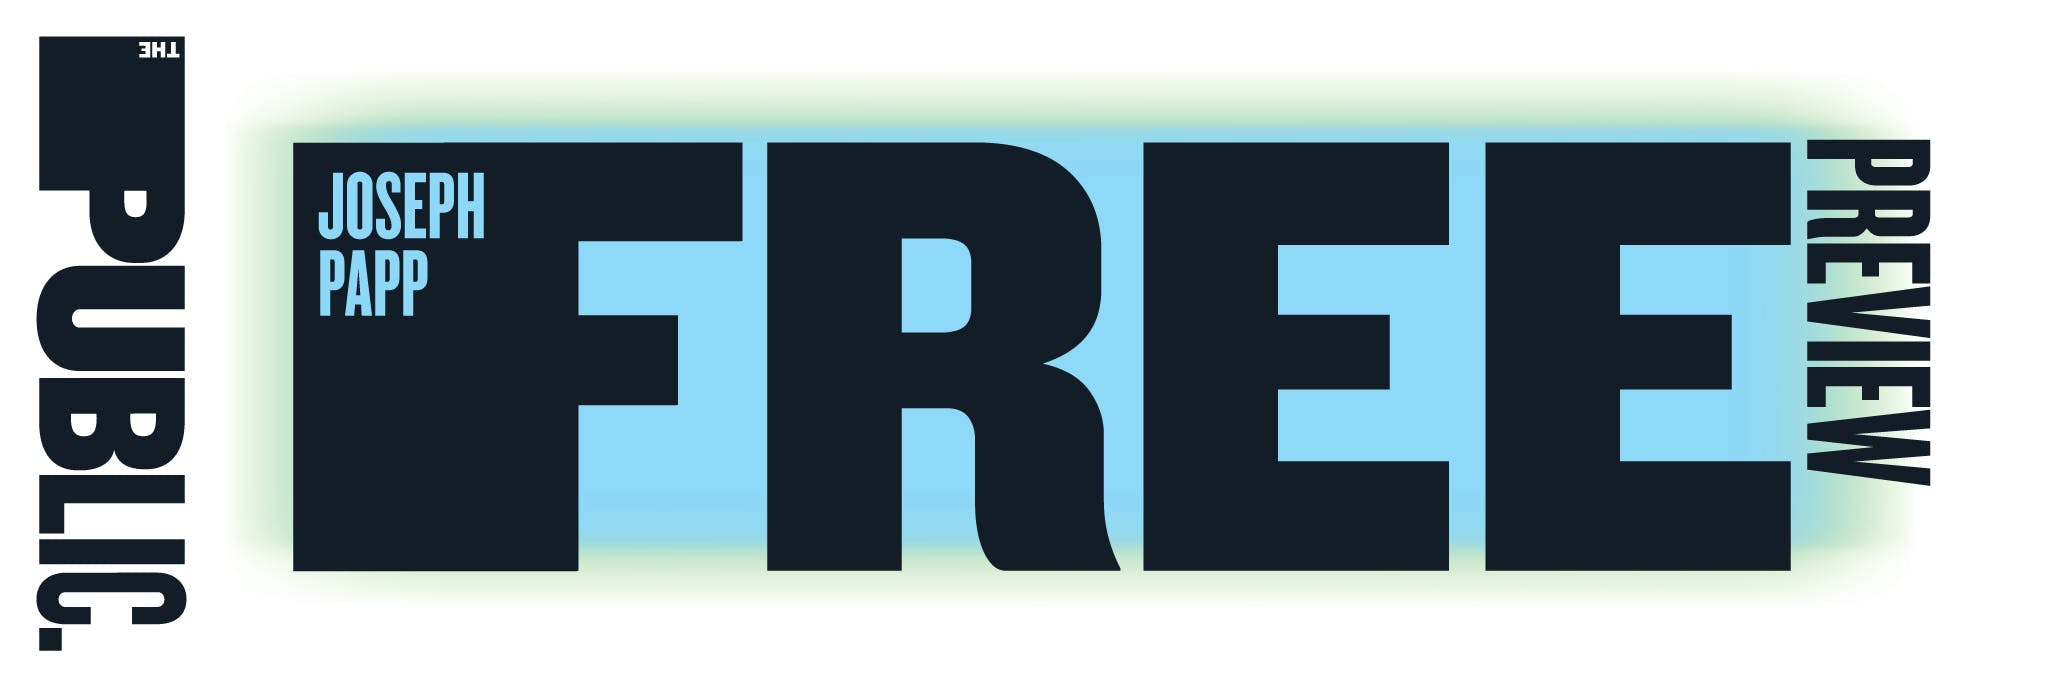 Joseph Papp Free Preview: White Noise Logo